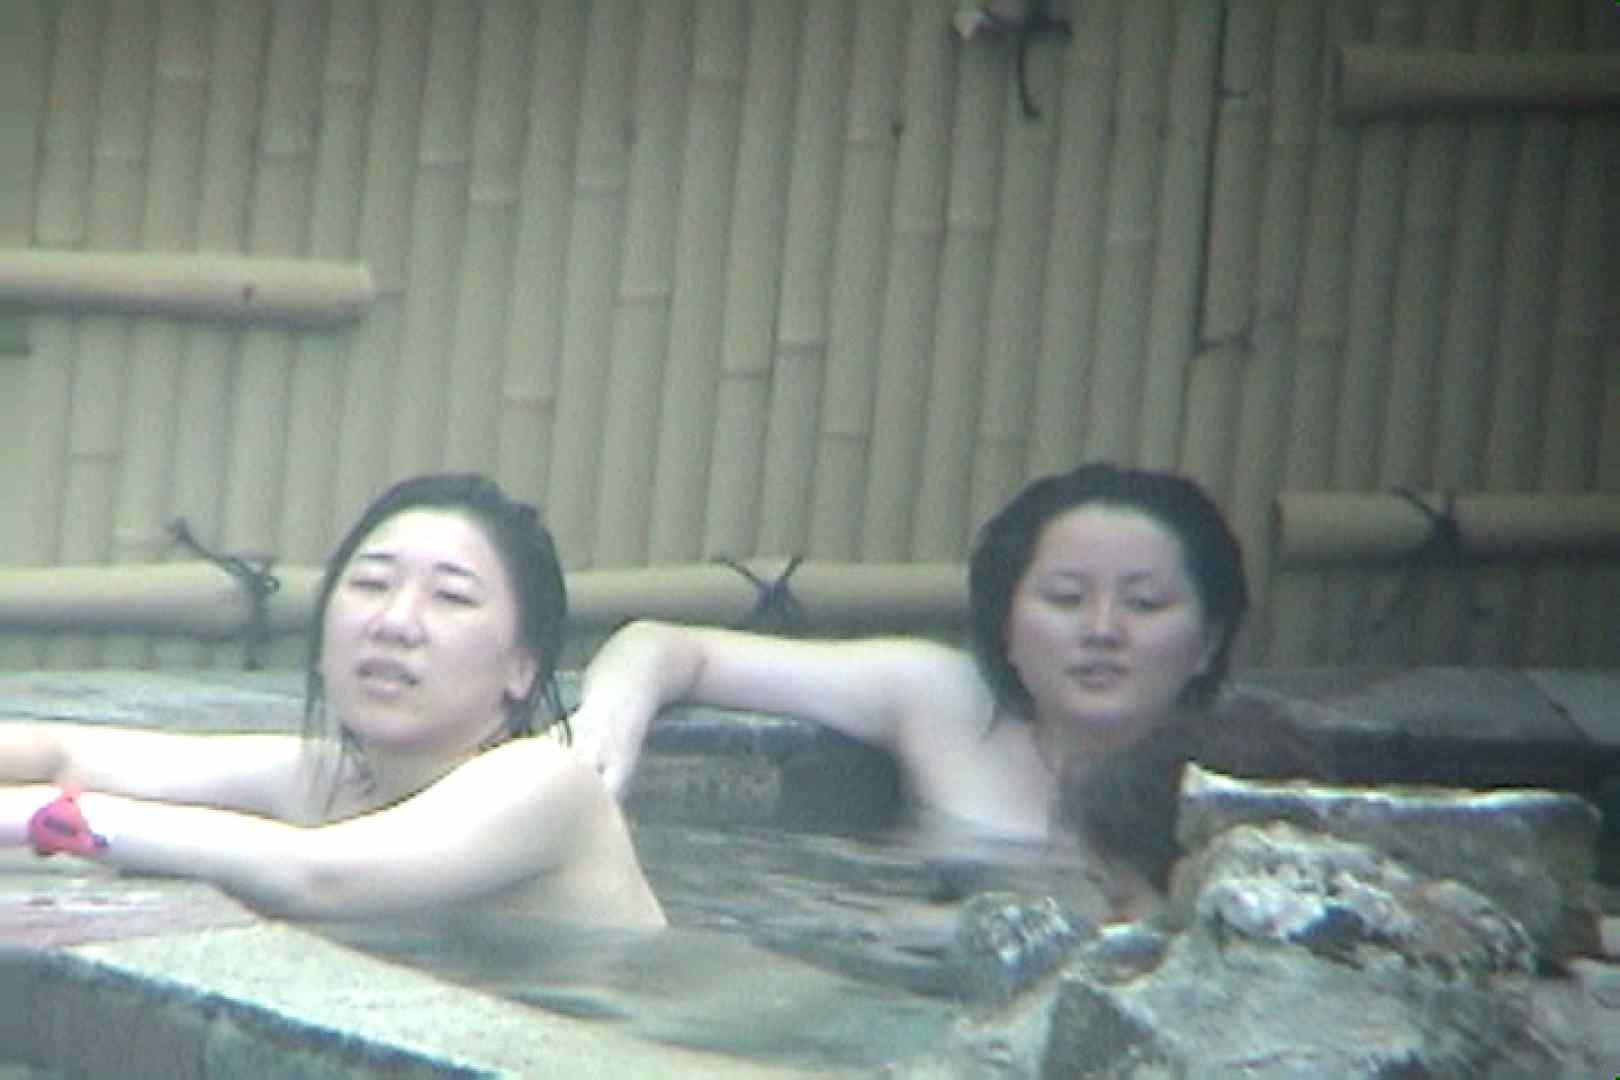 Aquaな露天風呂Vol.107 露天風呂 | OLのエロ生活  51連発 19